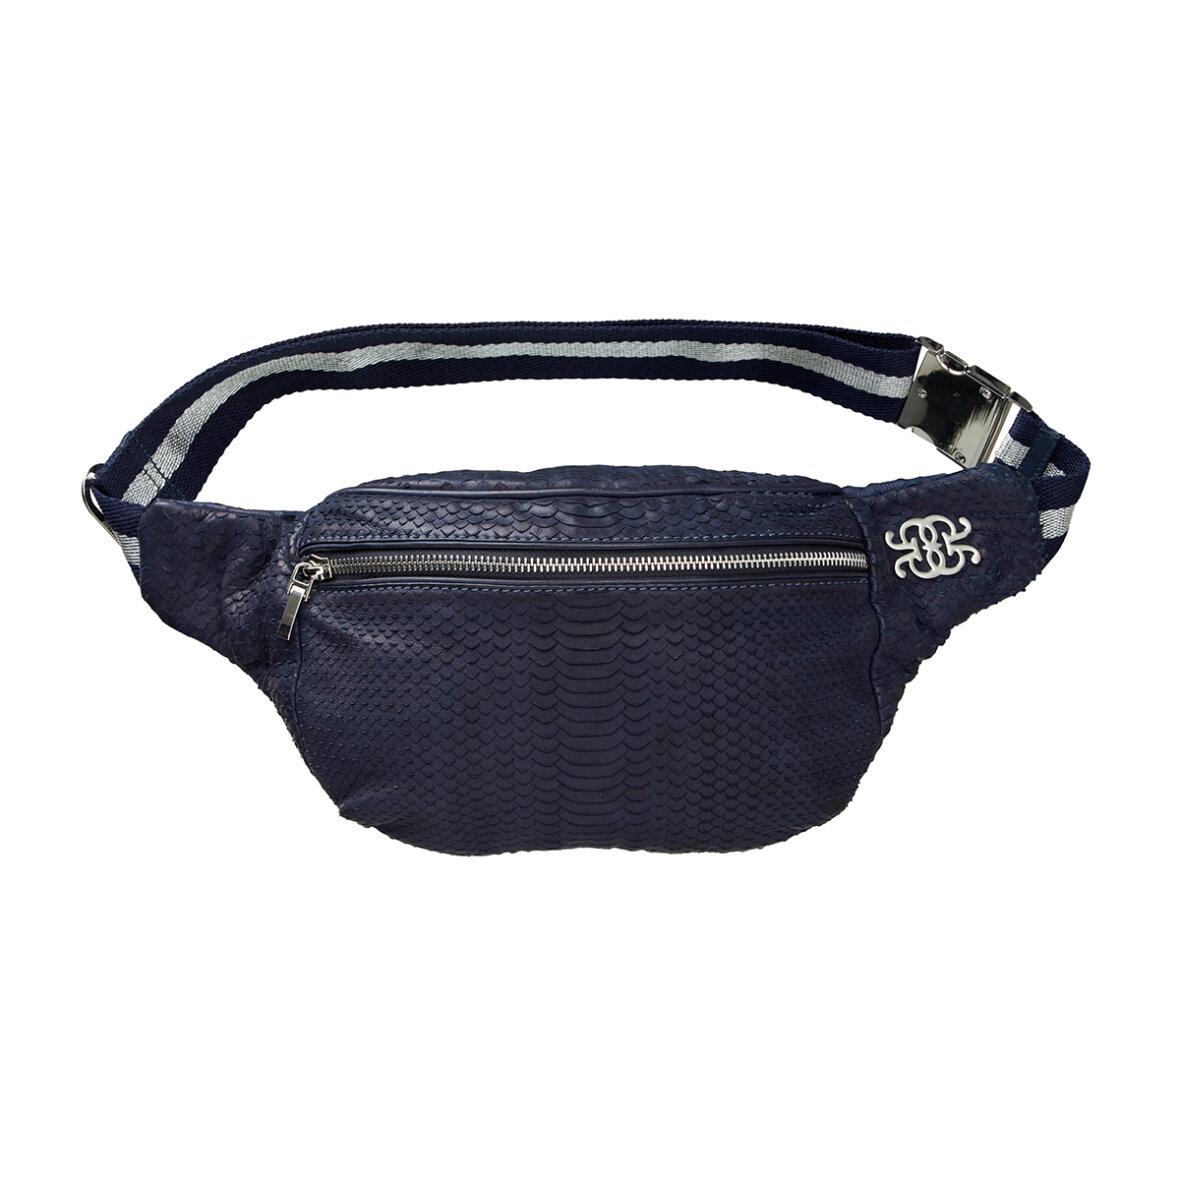 GUSTAV - Skind Bum Bag Blå - Jydepotten.dk - GRATIS FRAGT